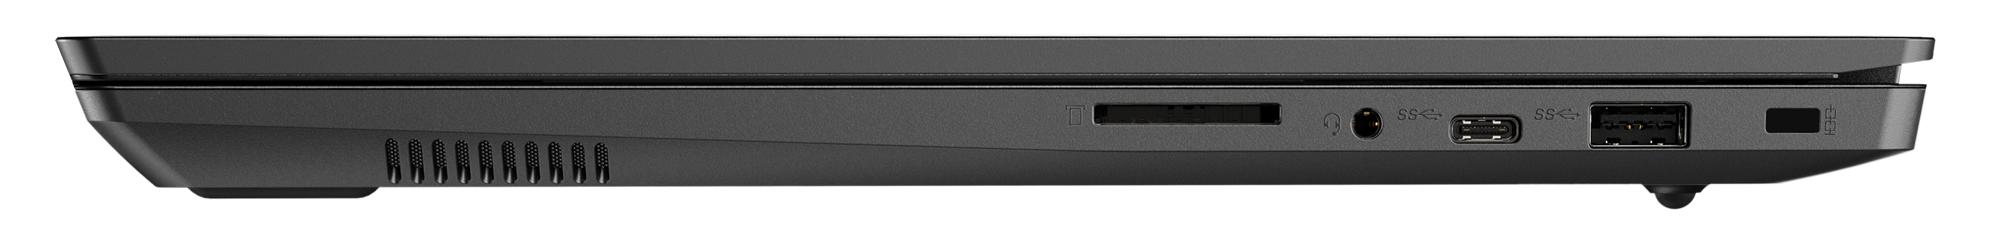 Фото  Ноутбук Lenovo V330-14 Grey (81B0004MRA)